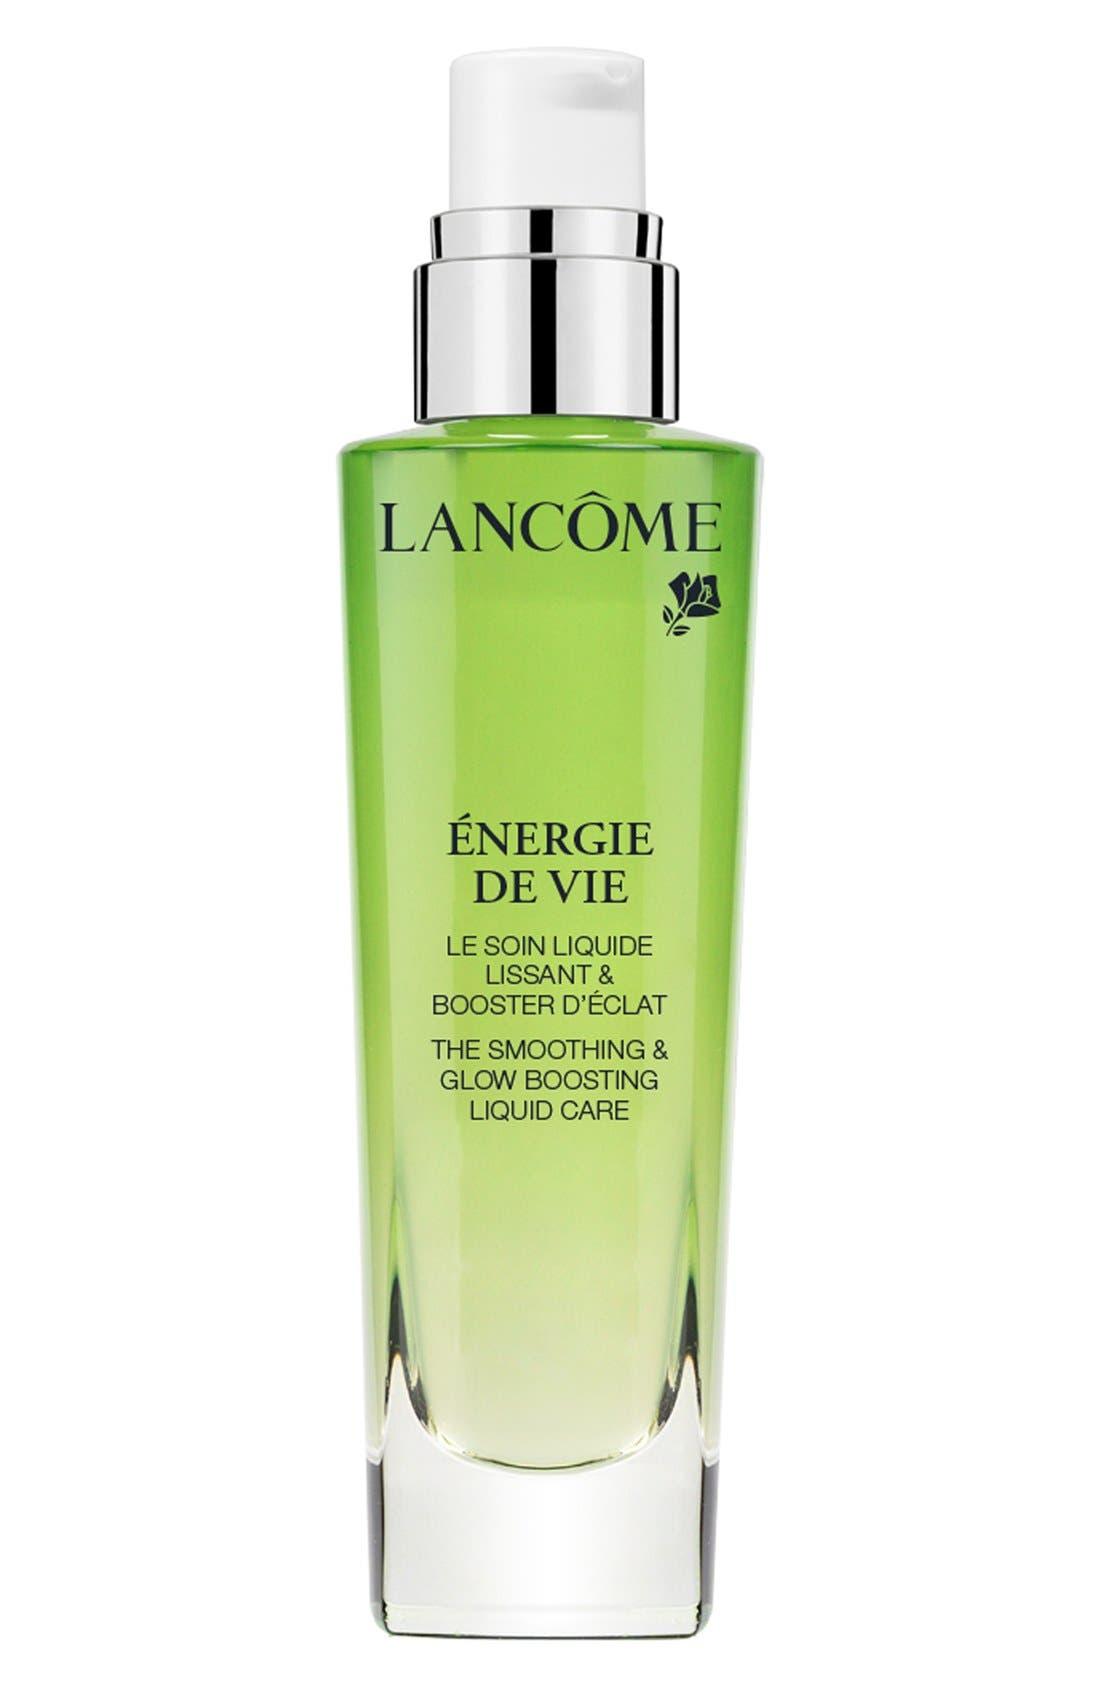 Lancôme Énergie de Vie Antioxidant & Glow Boosting Liquid Care Moisturizer